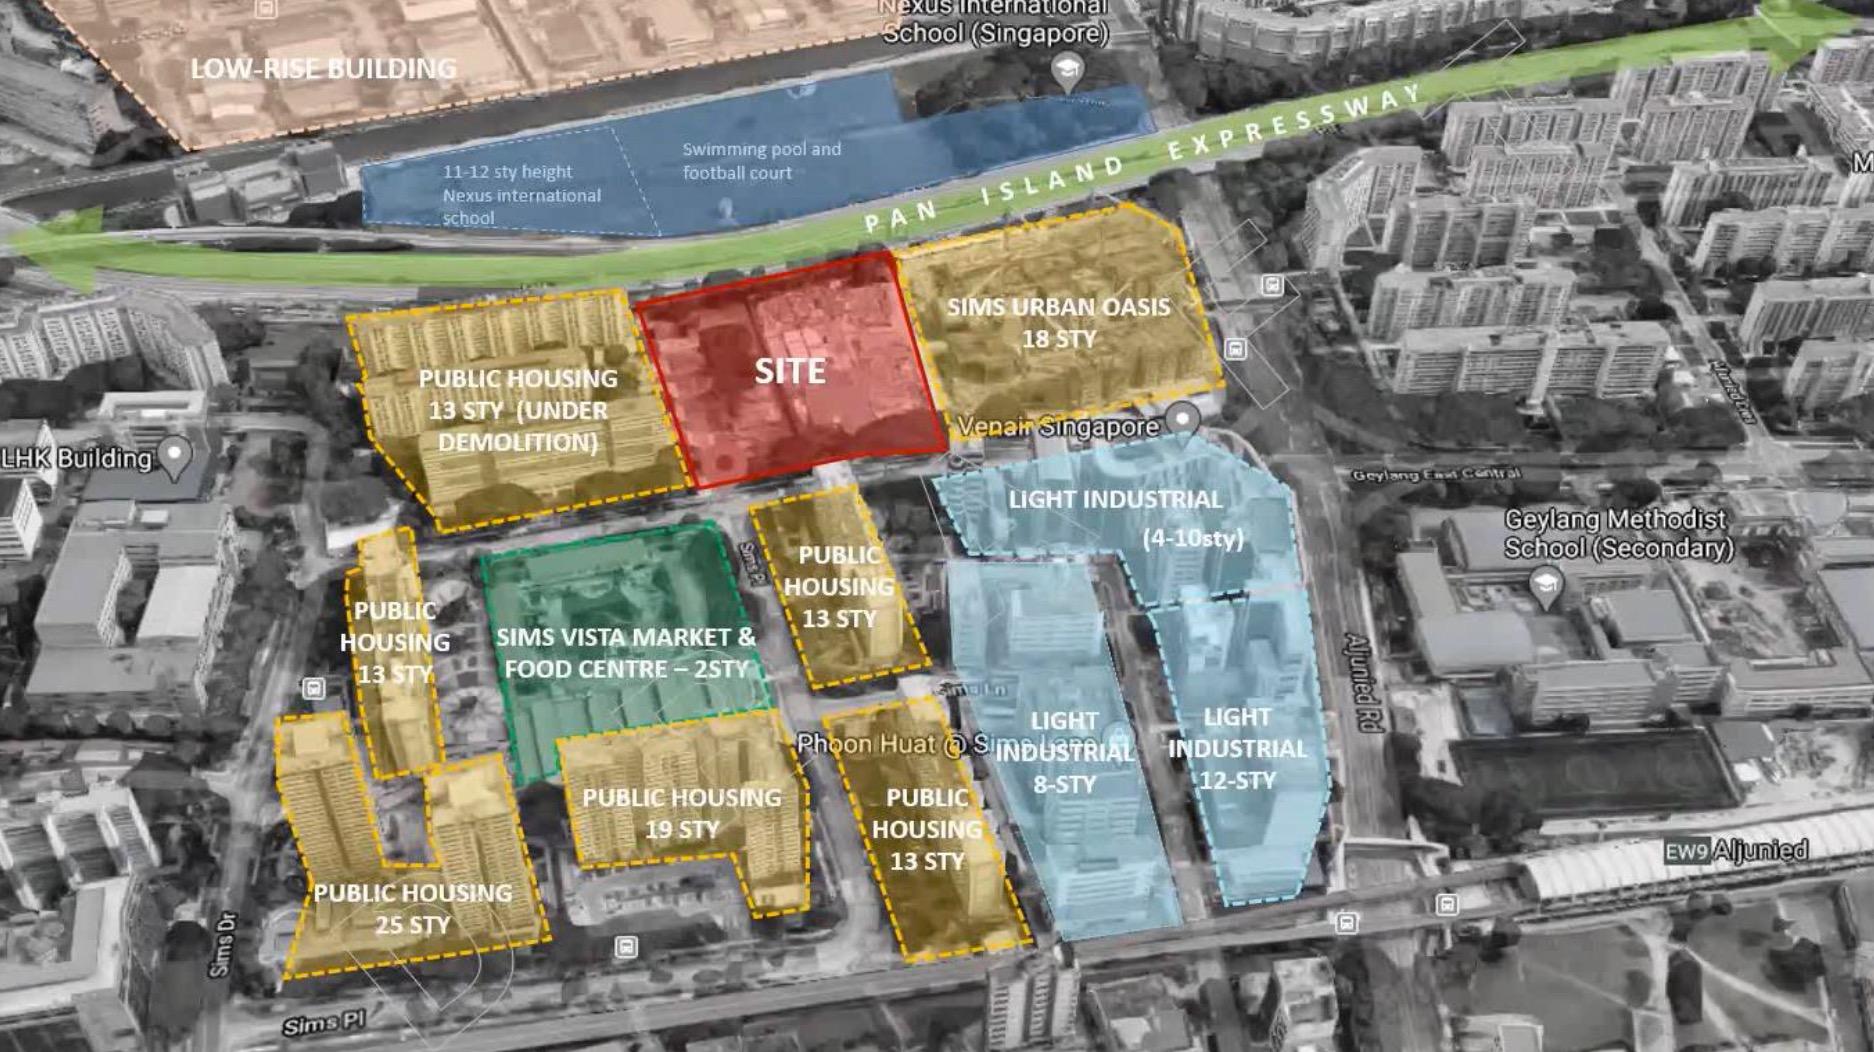 penrose-sims-condo-surrounding buildings